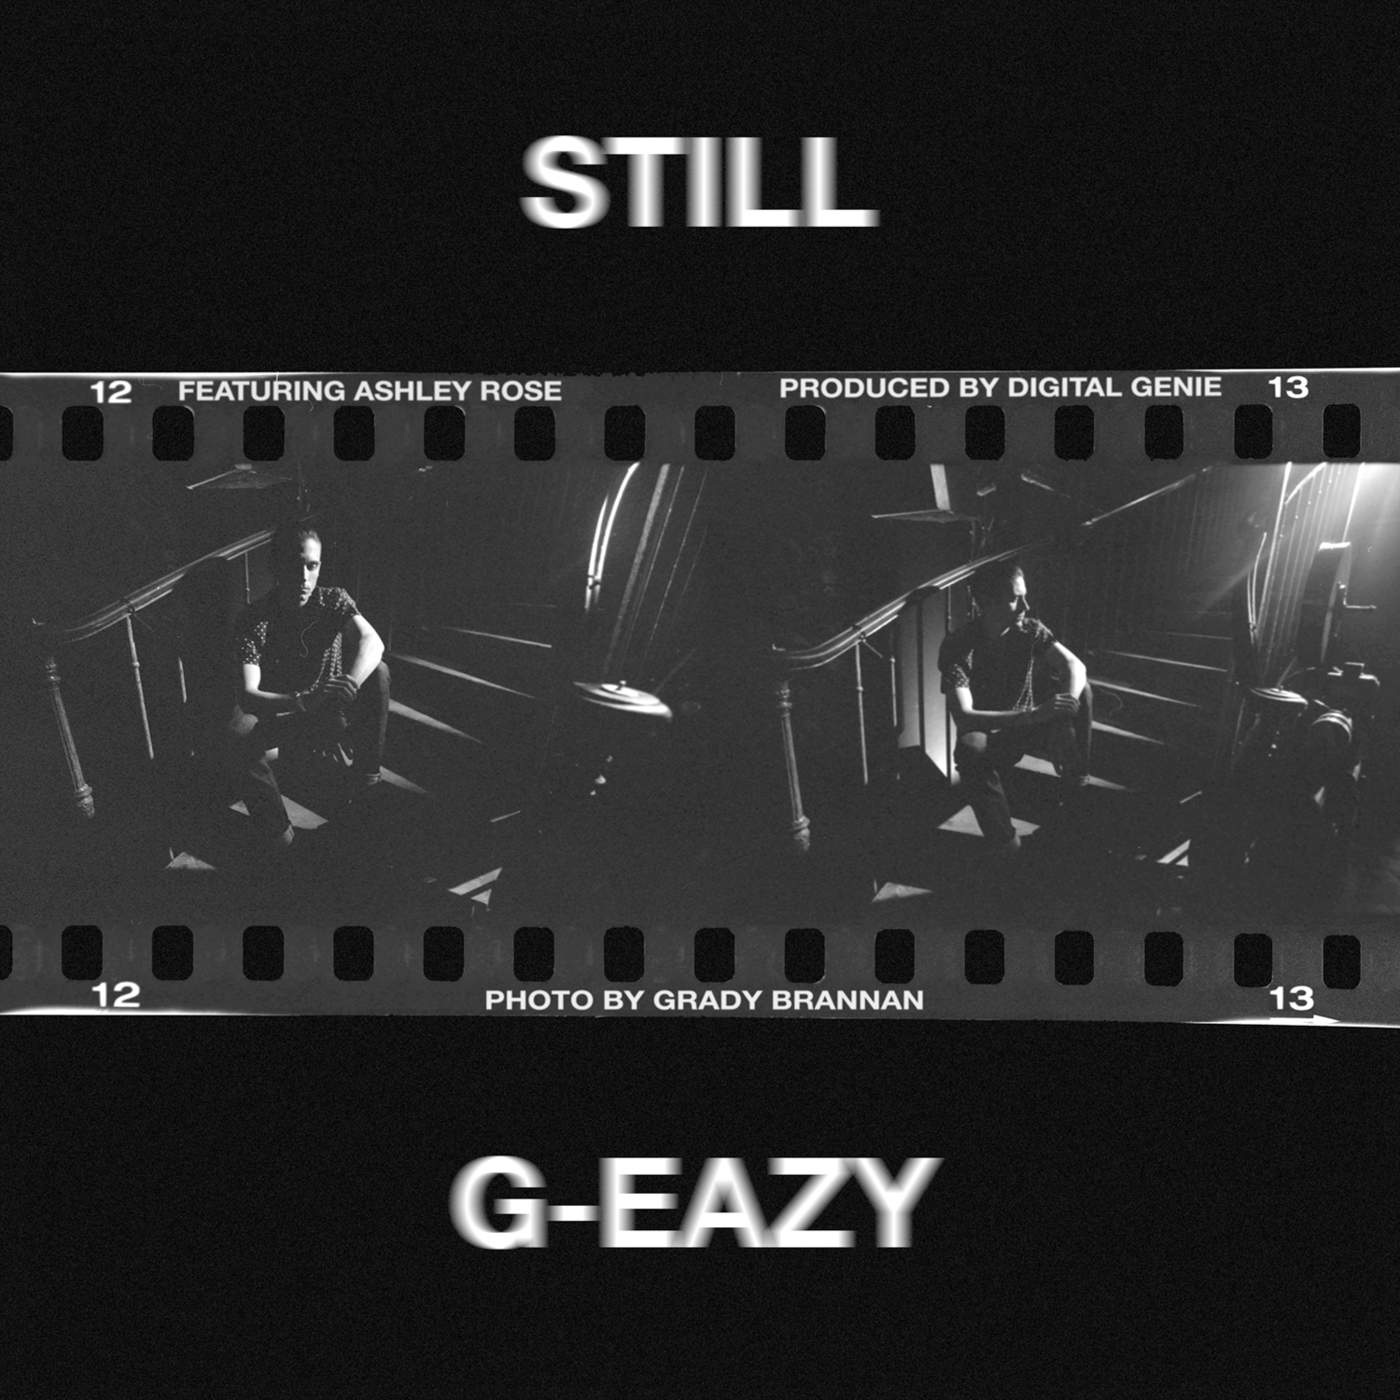 G-Eazy - Still - Single Cover